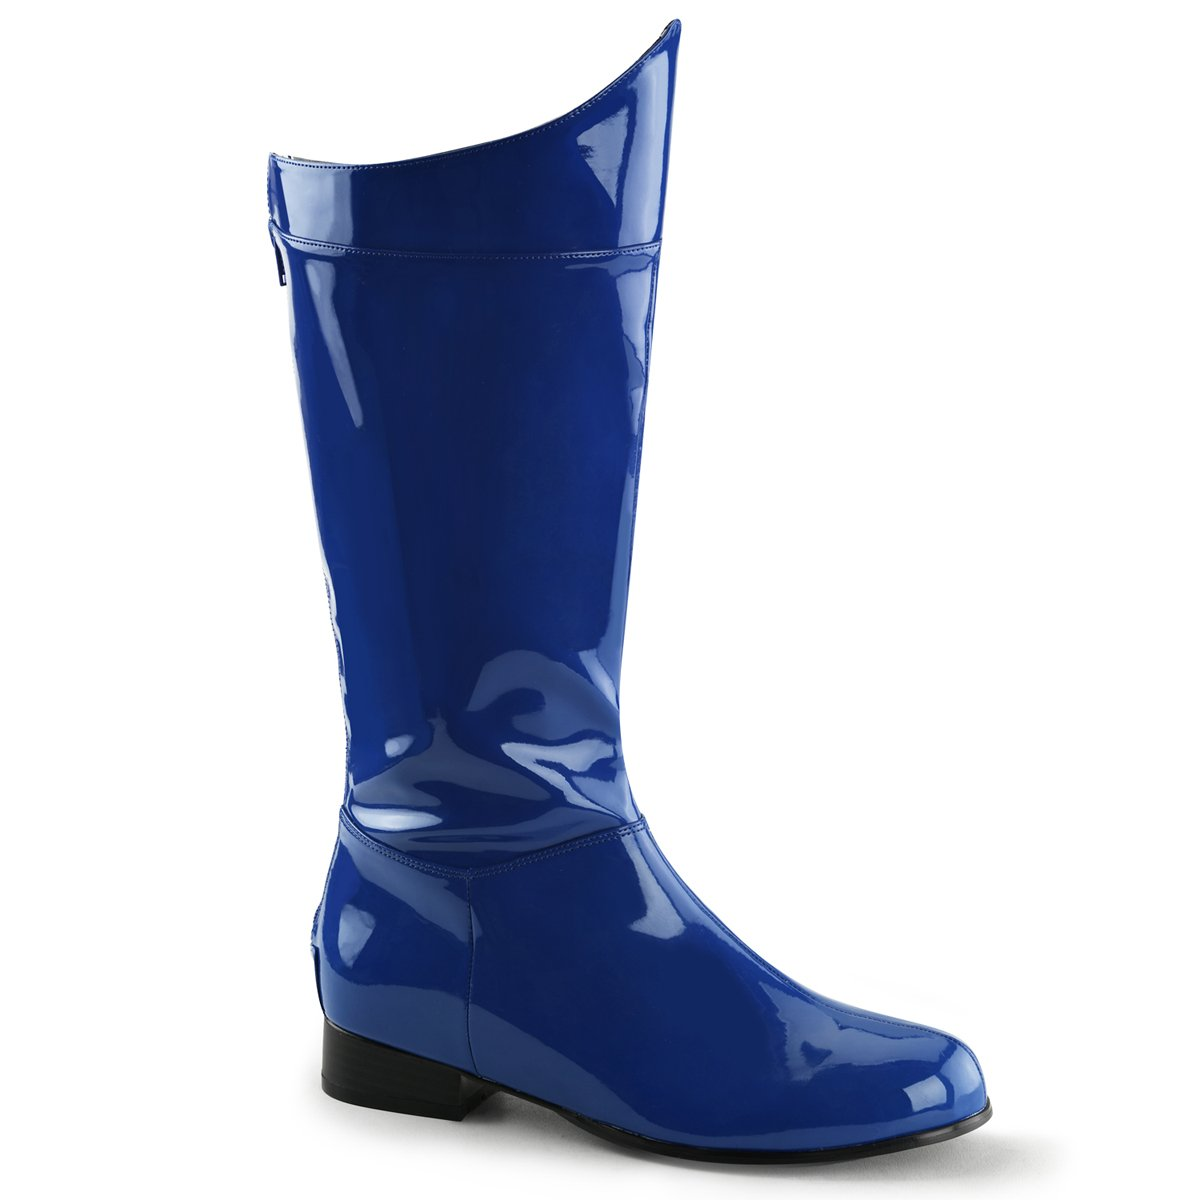 Funtasma Men's Hero 100 Engineer Boot B01MDLY4XL Small|Blue Pat